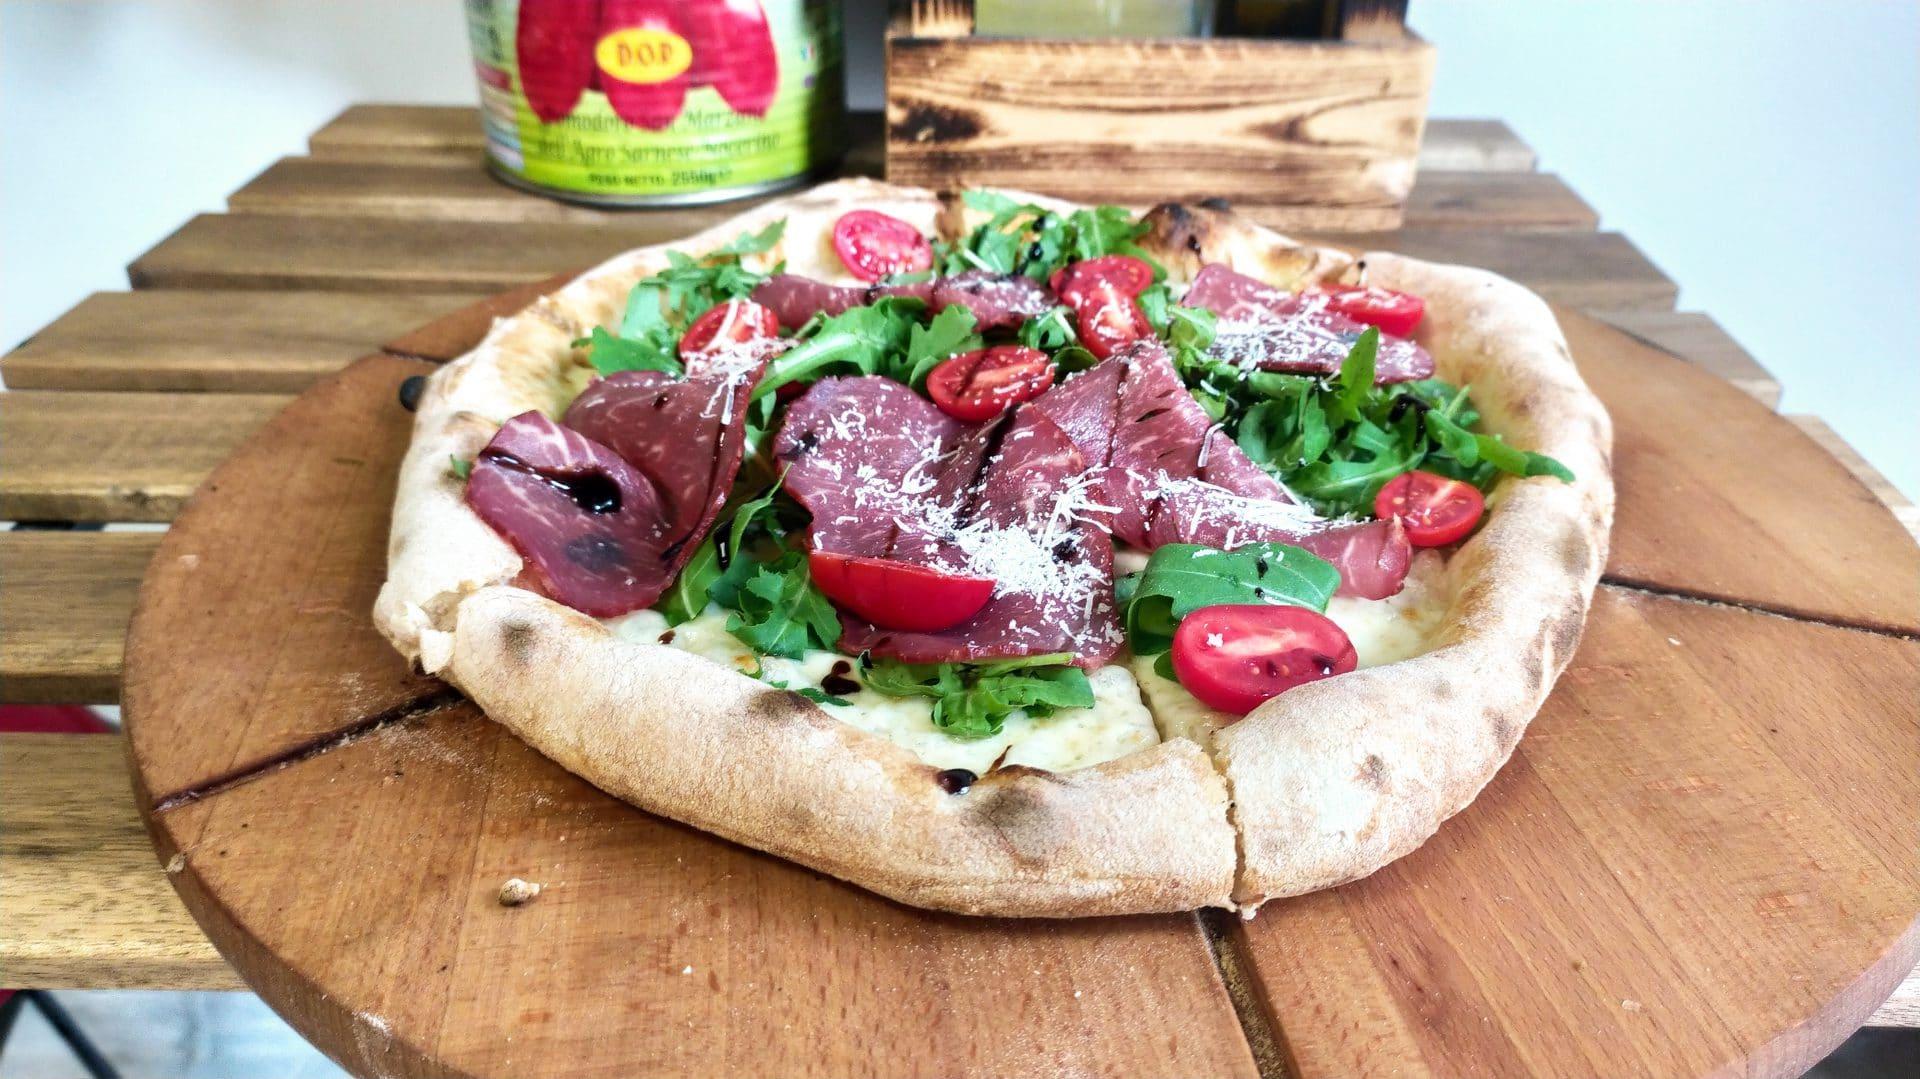 Pizza Square robi pizze sezonowe. Na zdjęciu pizza z rostbefem.